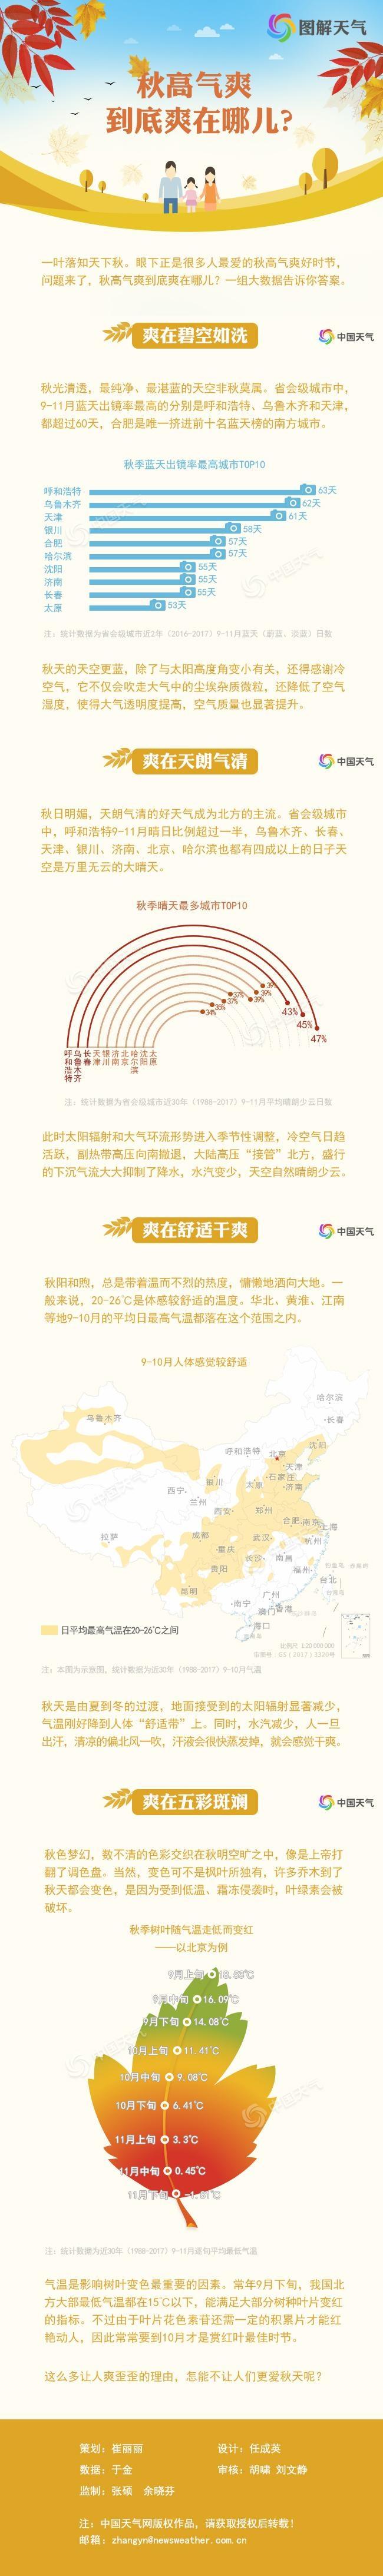 http://www.mhkcctv.com/caijingfenxi/27014.html